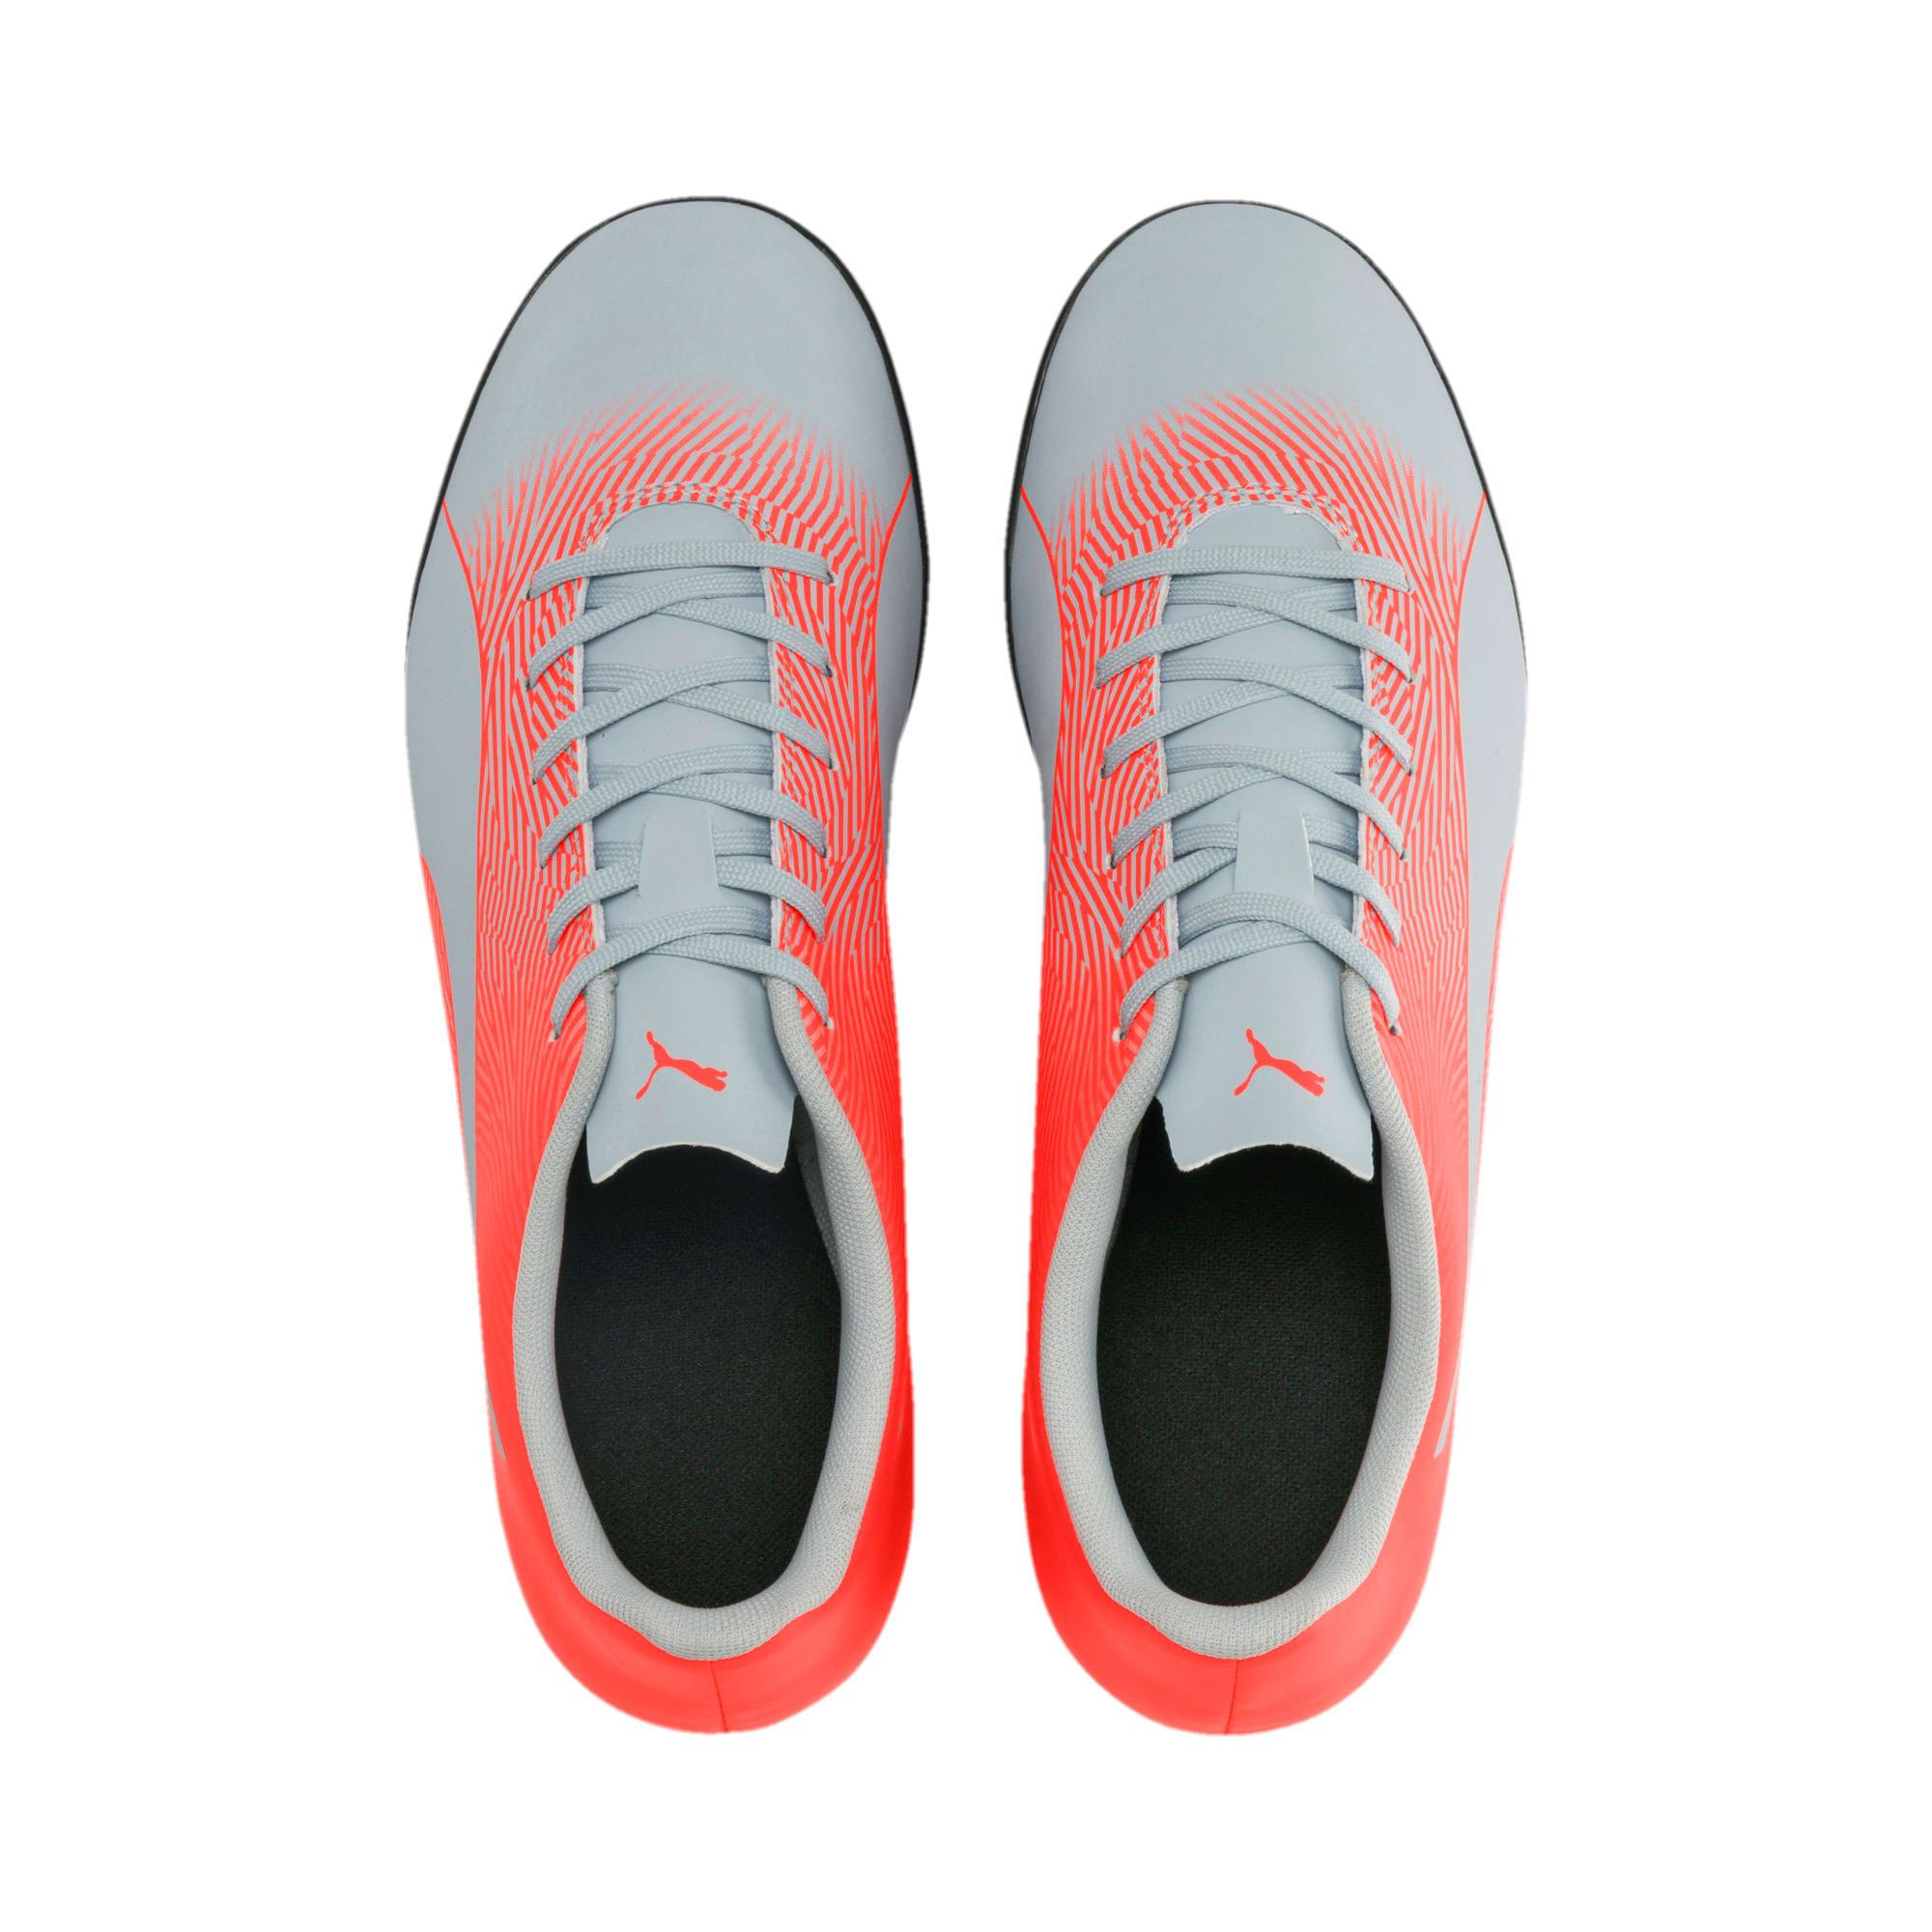 Thumbnail 7 of PUMA Spirit II TT Men's Soccer Shoes, Glacial Blue-Nrgy Red, medium